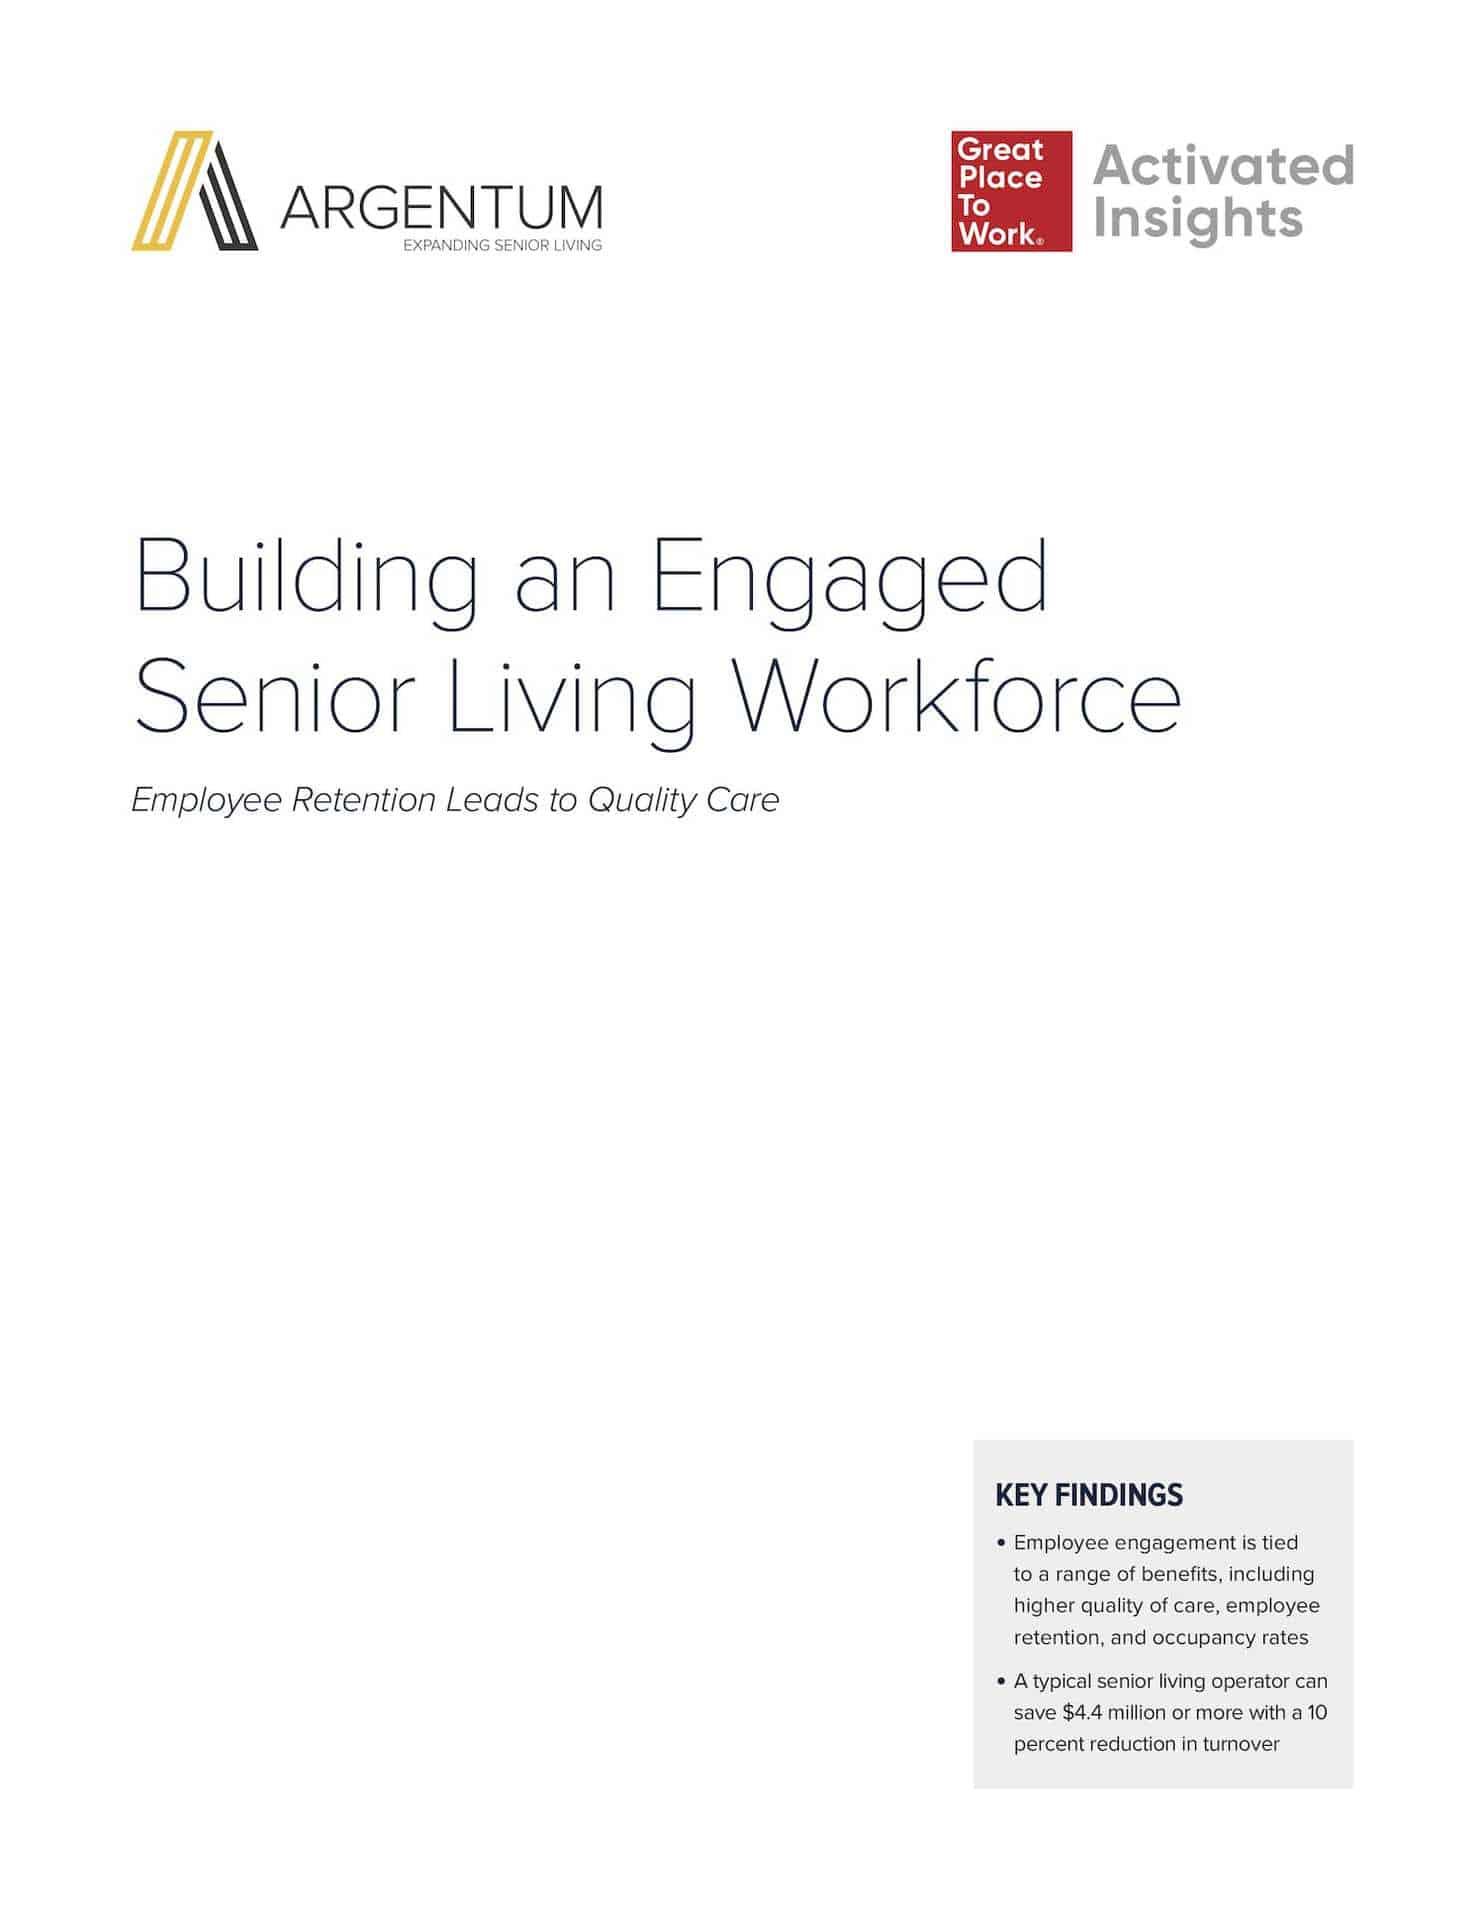 Building an Engaged Senior Living Workforce